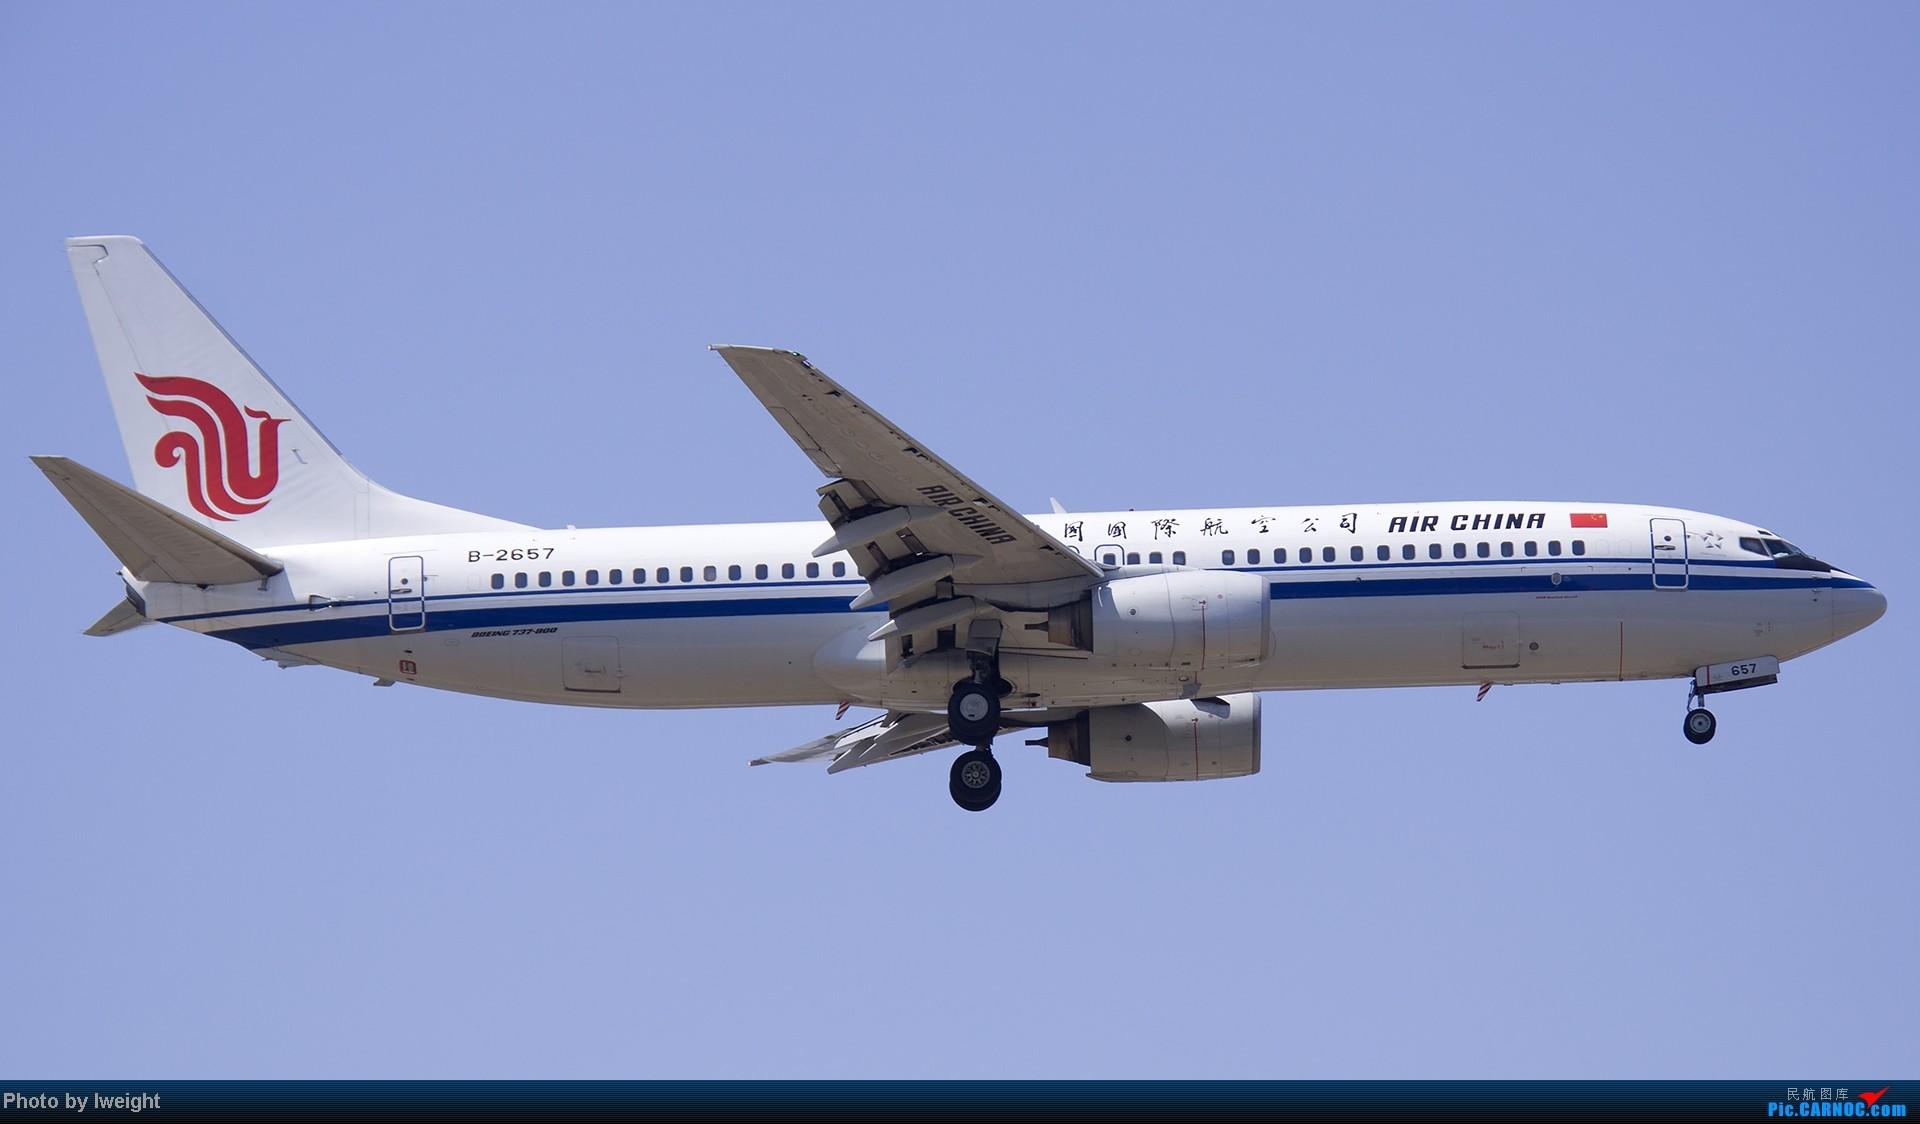 Re:[原创]北京难得的好天气,收获多种机型和彩绘,遗憾的是再次错过卡航巴塞罗那彩绘 BOEING 737-800 B-2657 中国北京首都机场